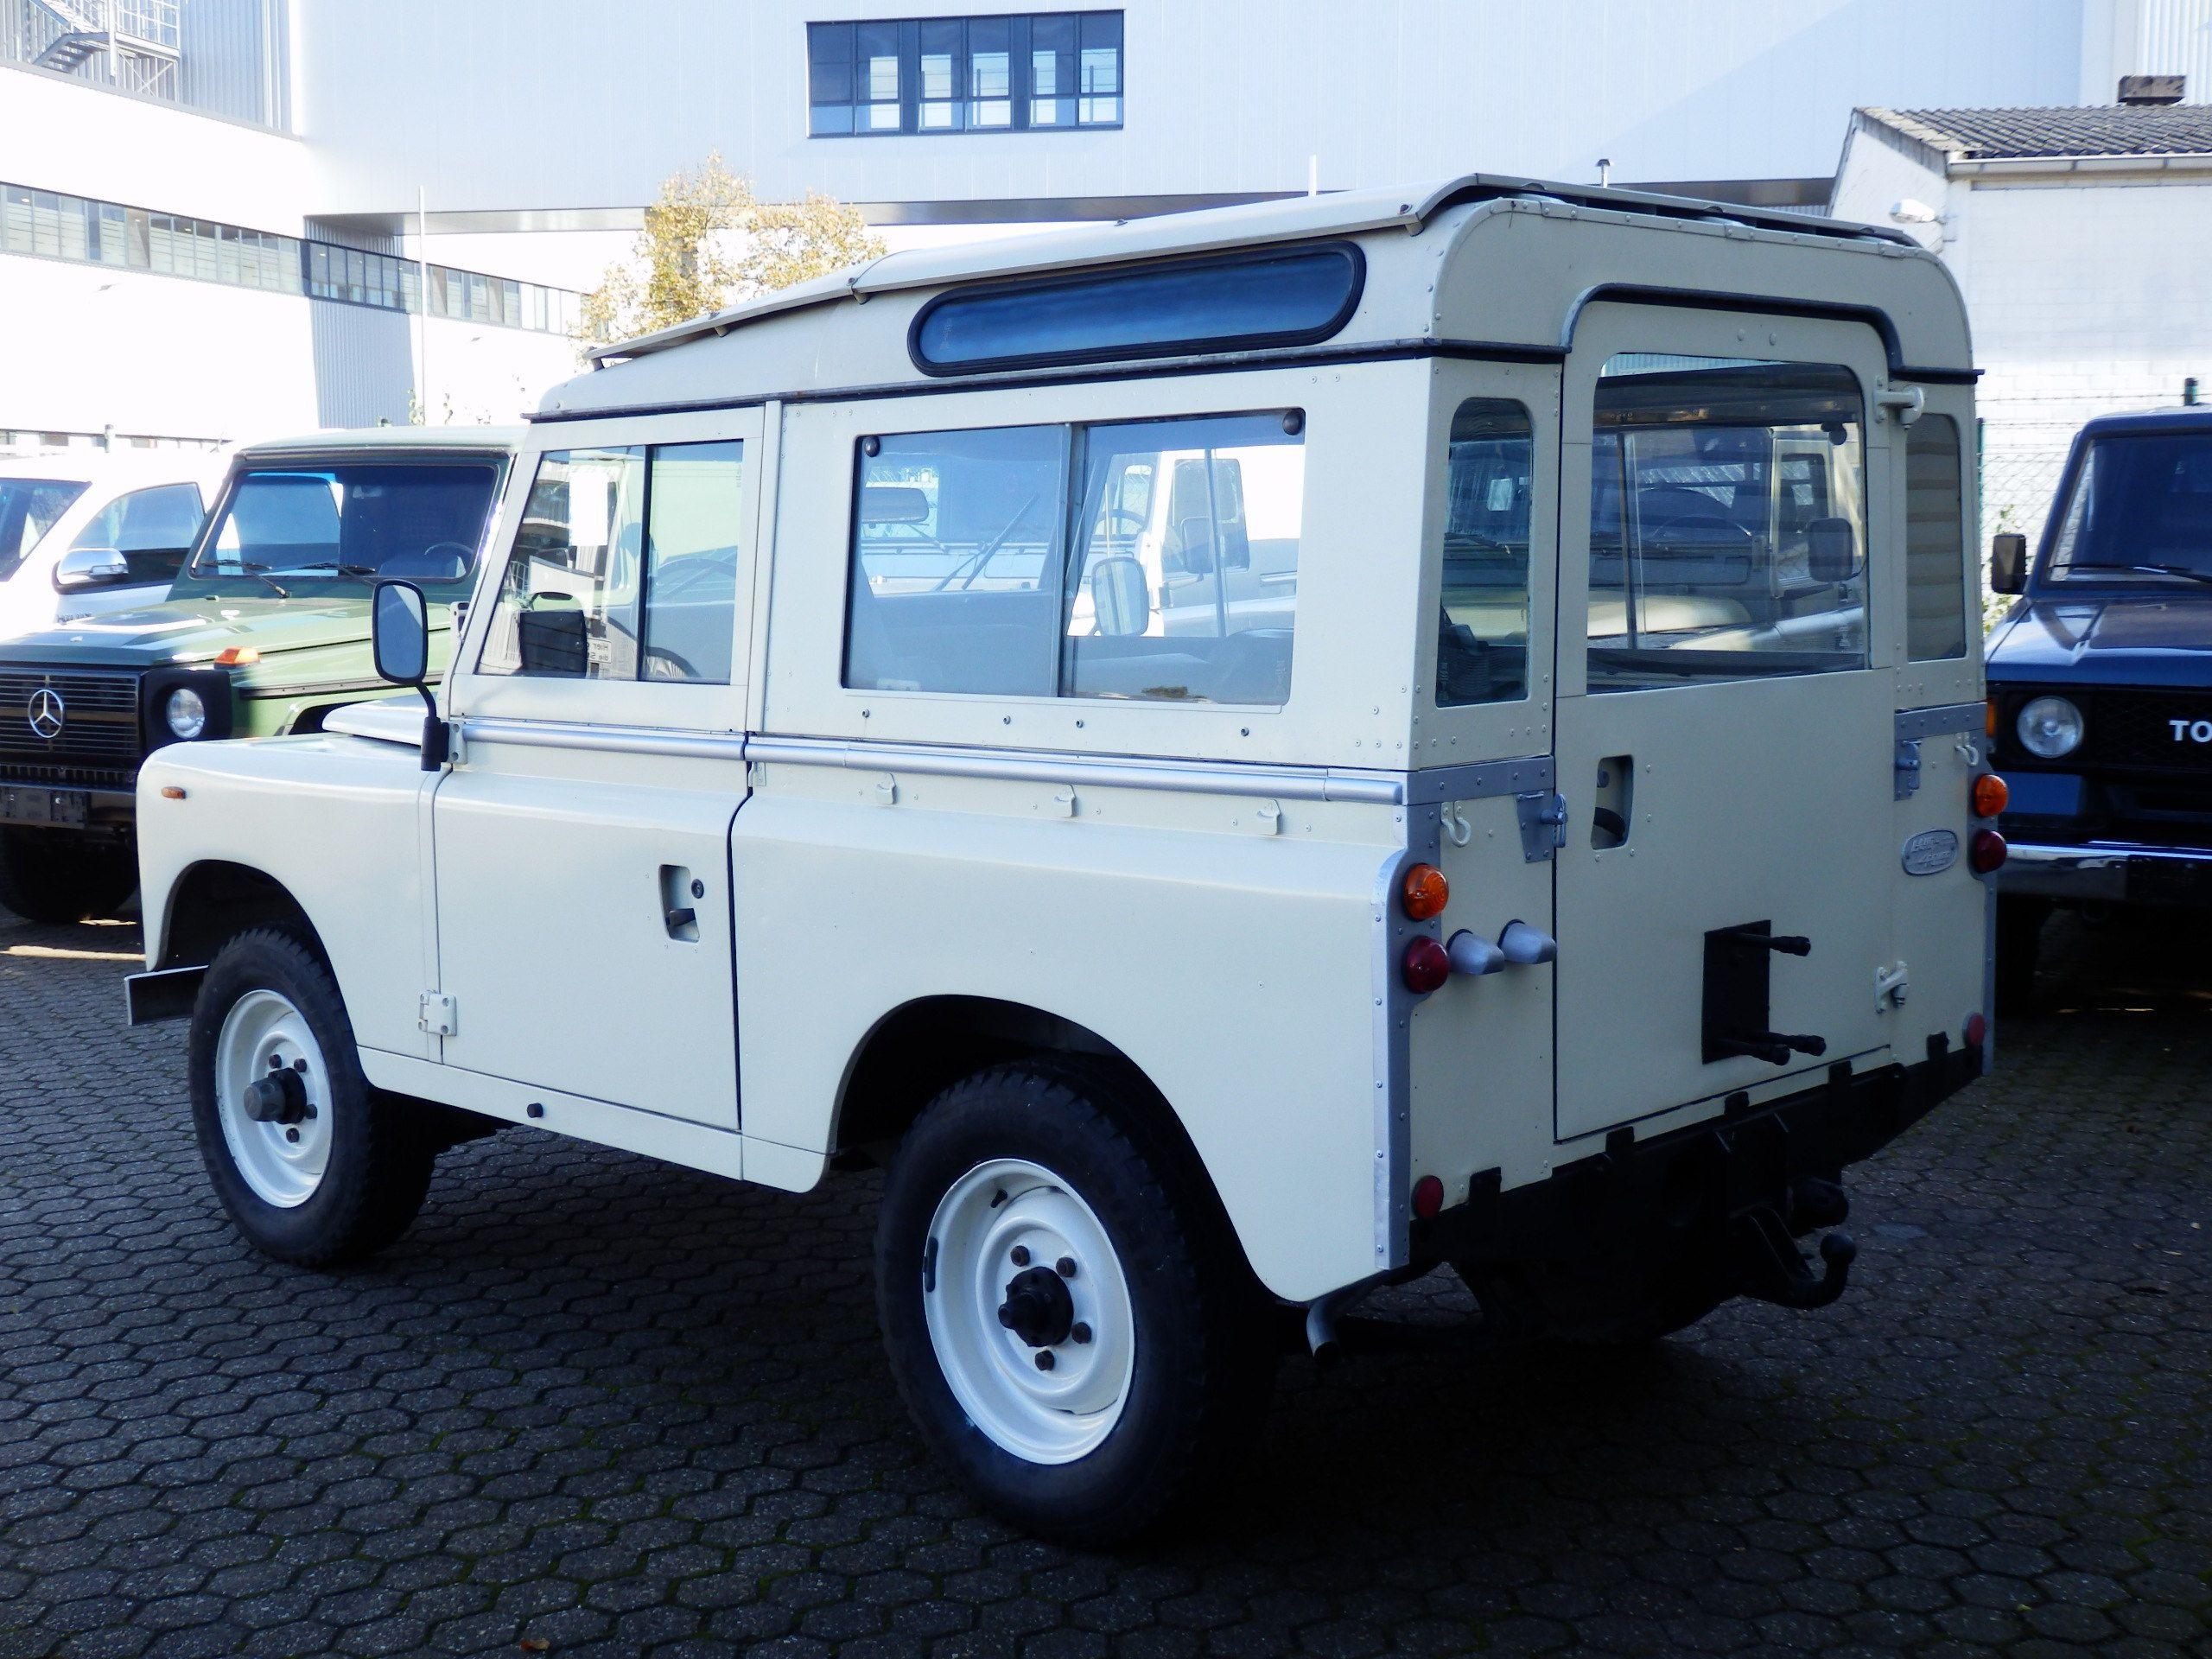 Land Rover Serie III f Road Technik GmbH